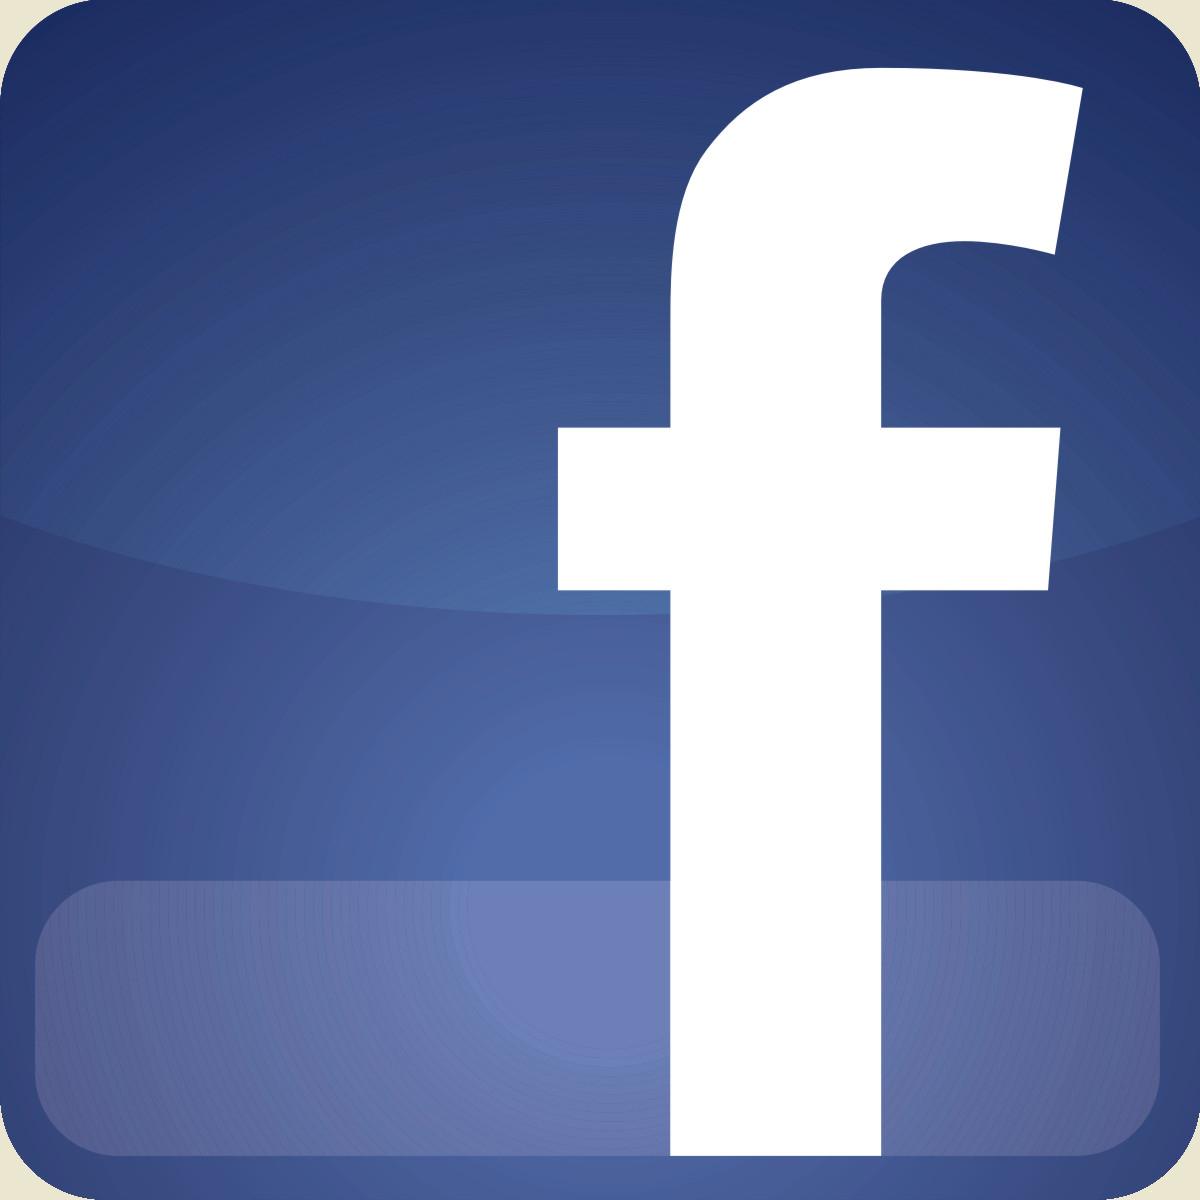 Free Facebook Cliparts, Download Free Clip Art, Free Clip